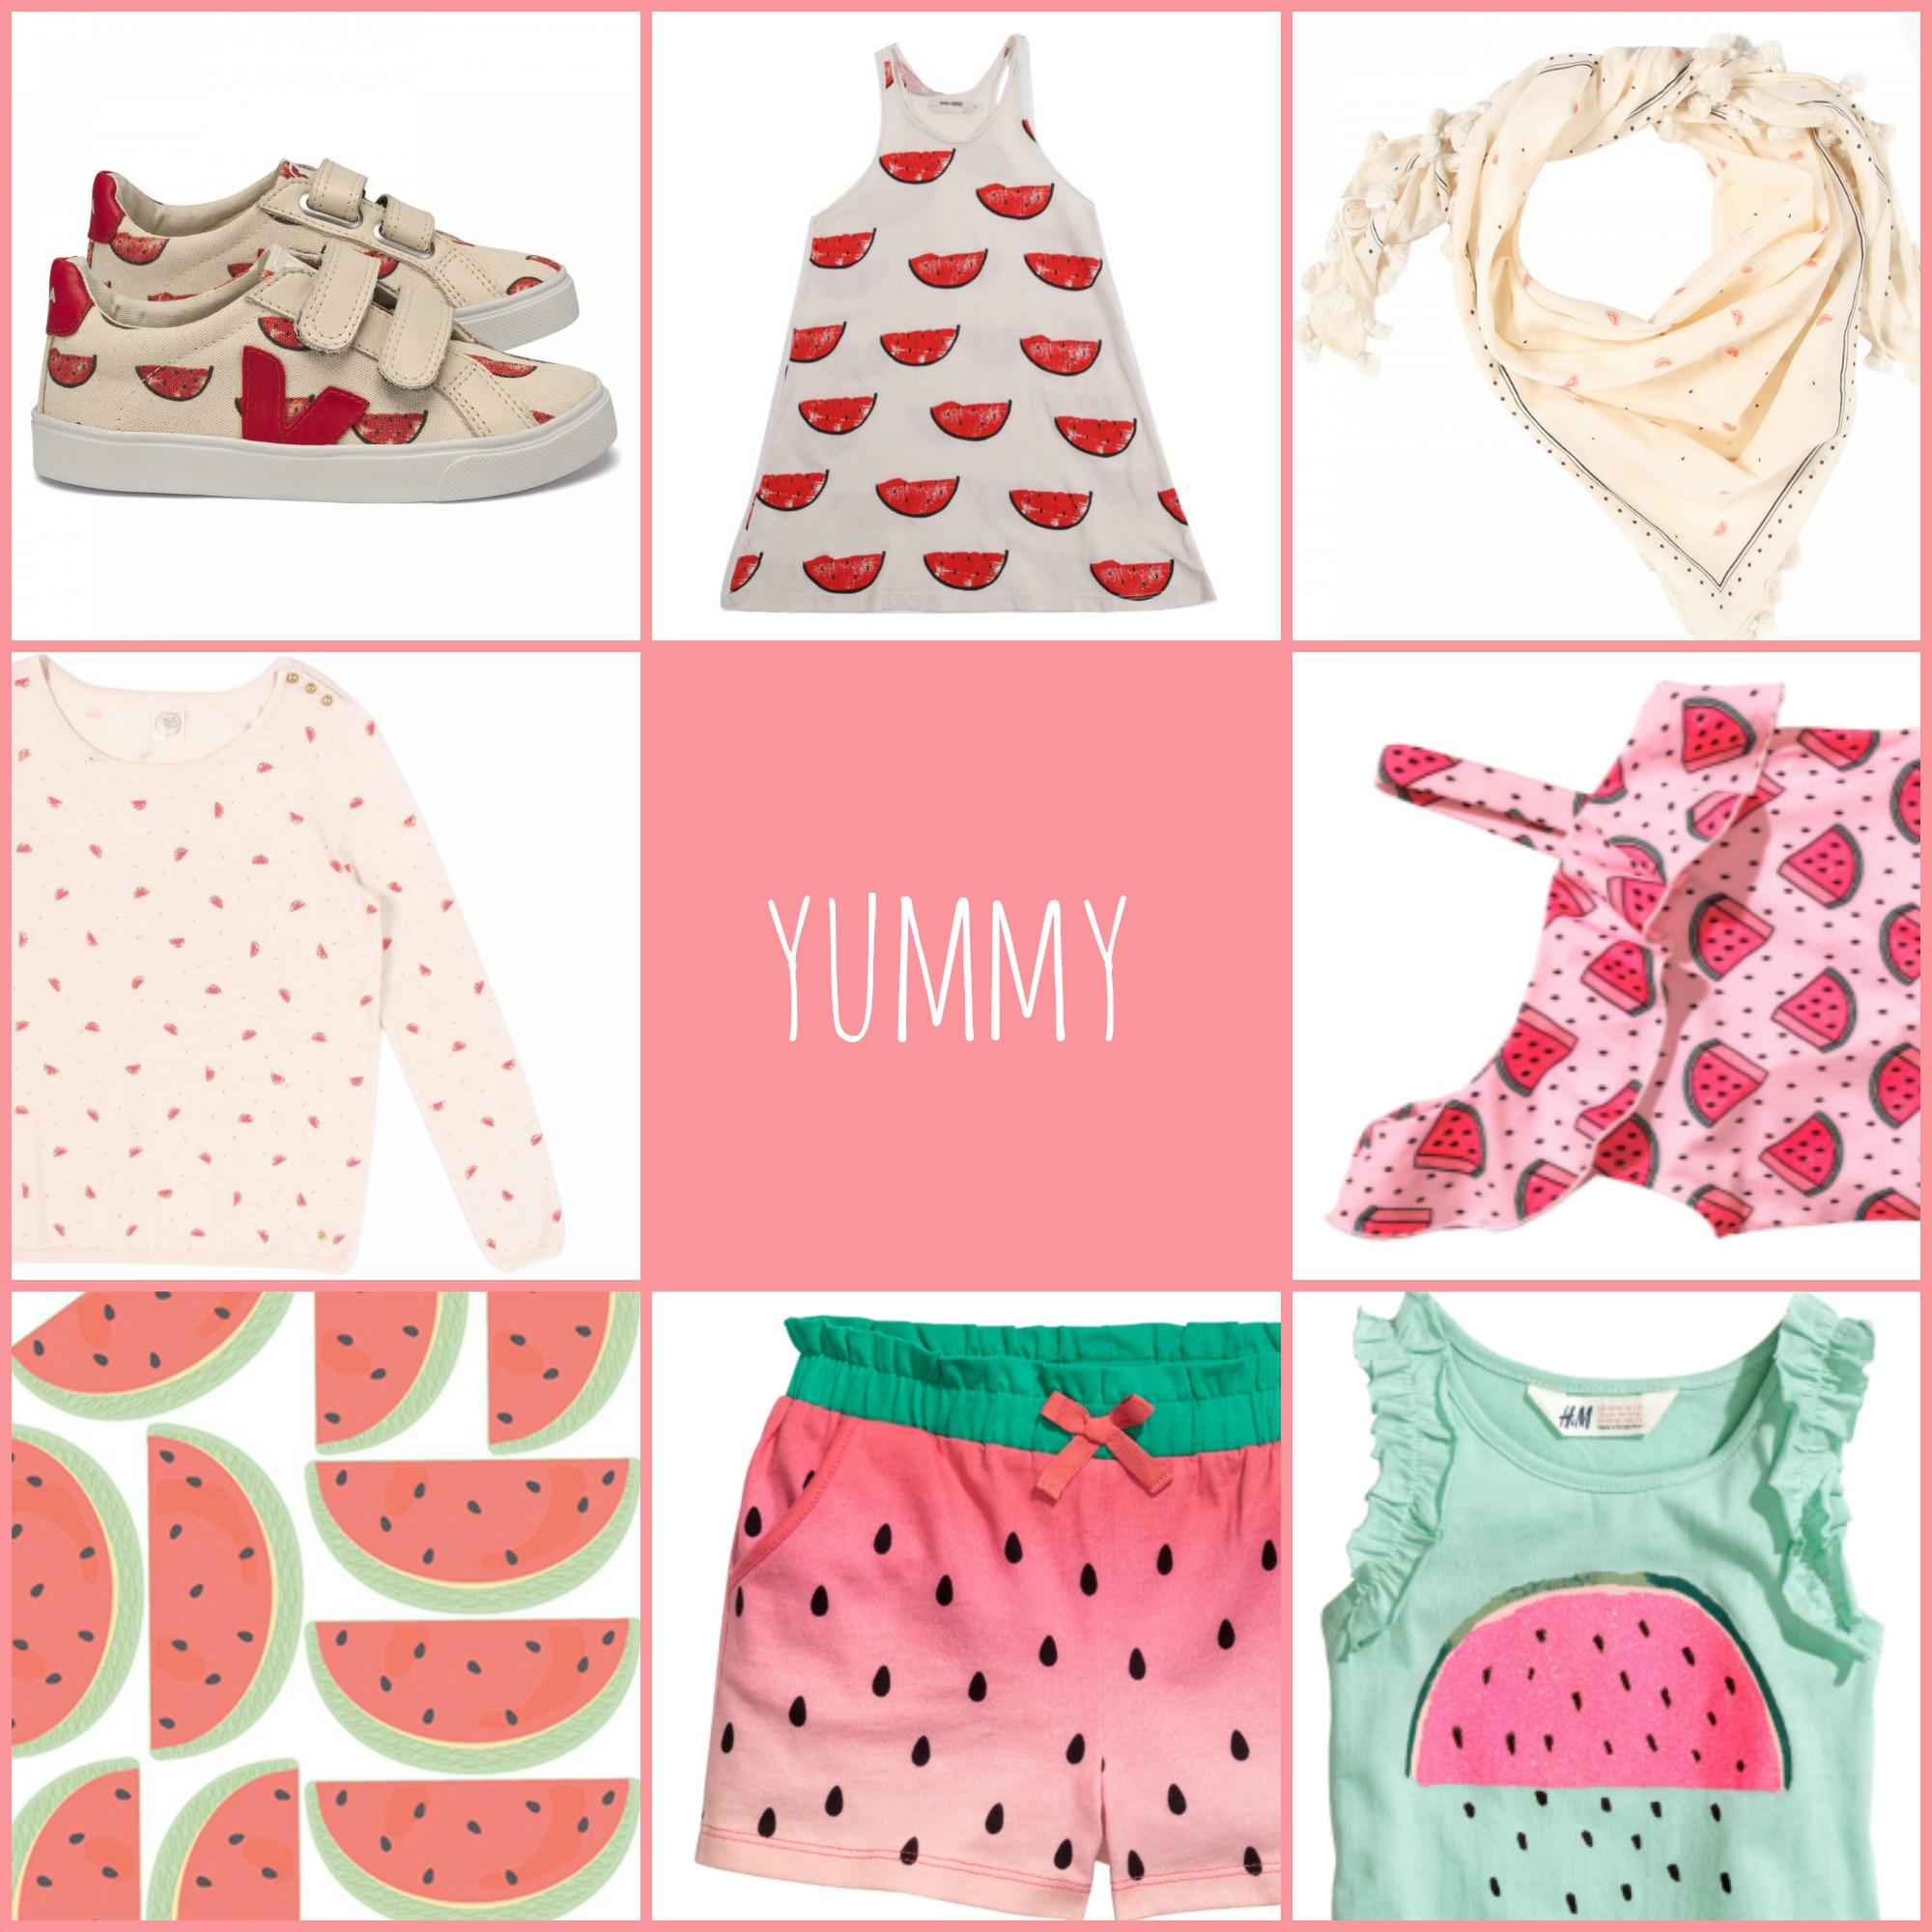 Wassermelonen-Prints